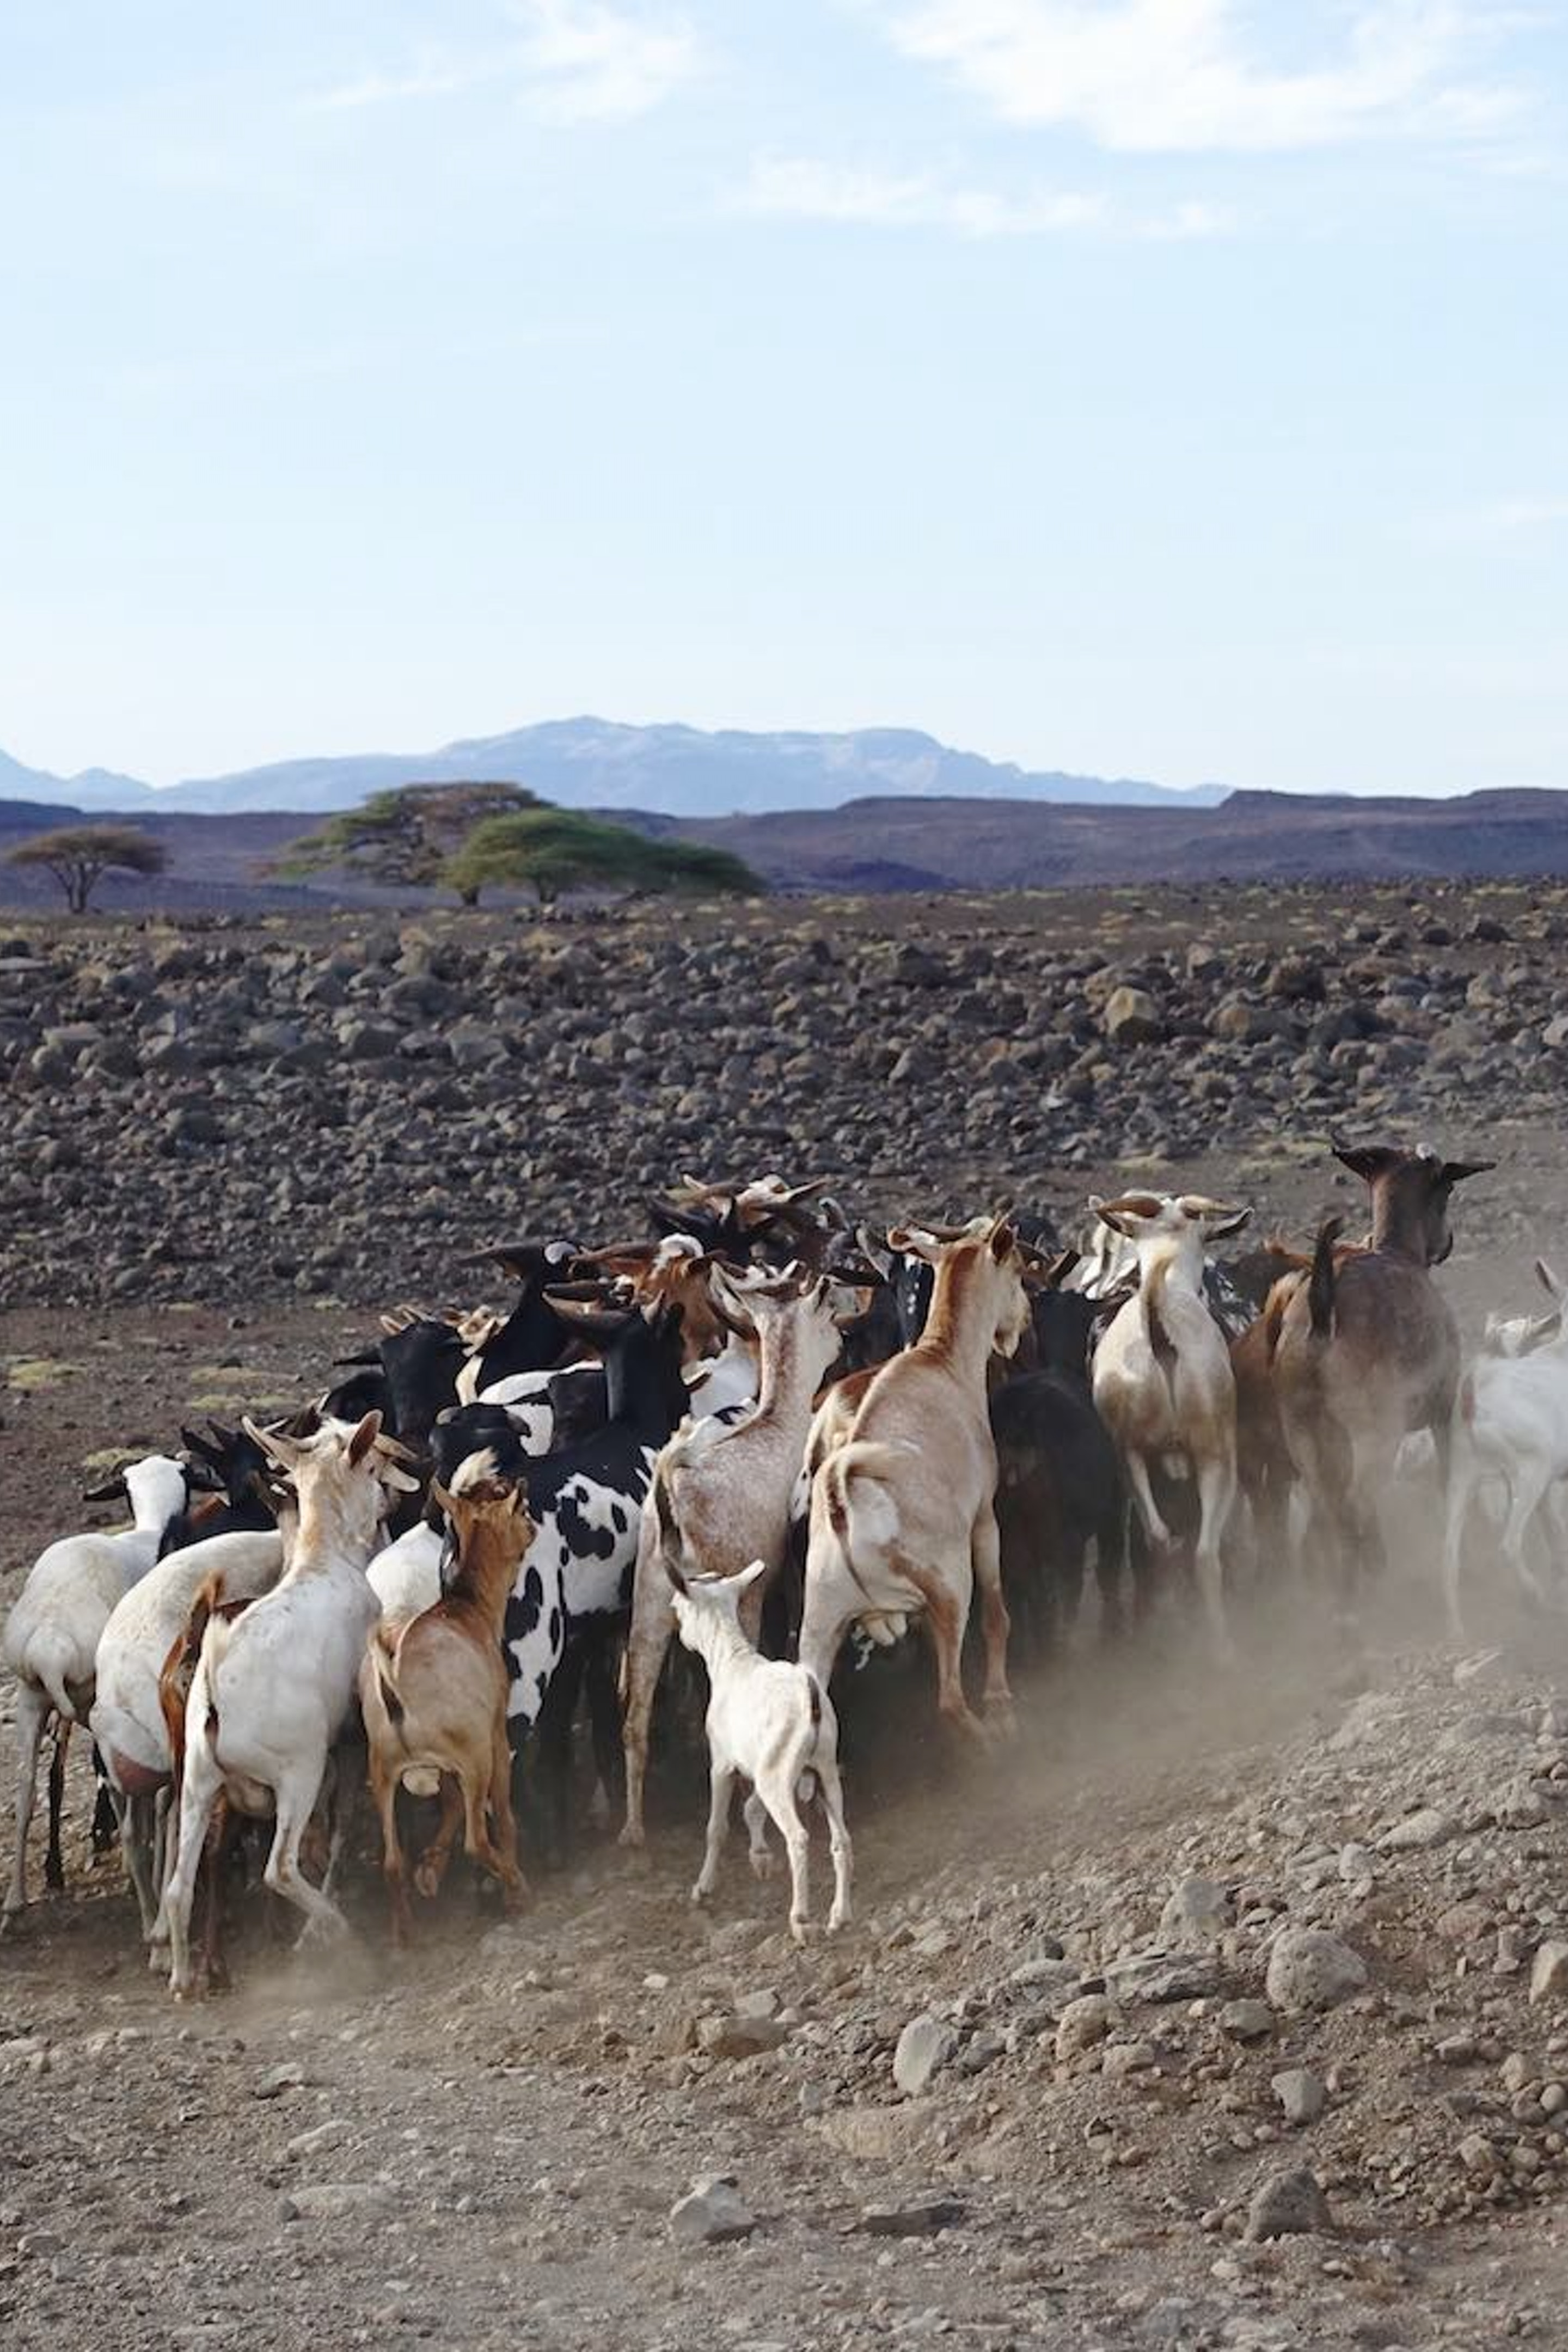 Danwatch report on Lake Turkana Wind Power